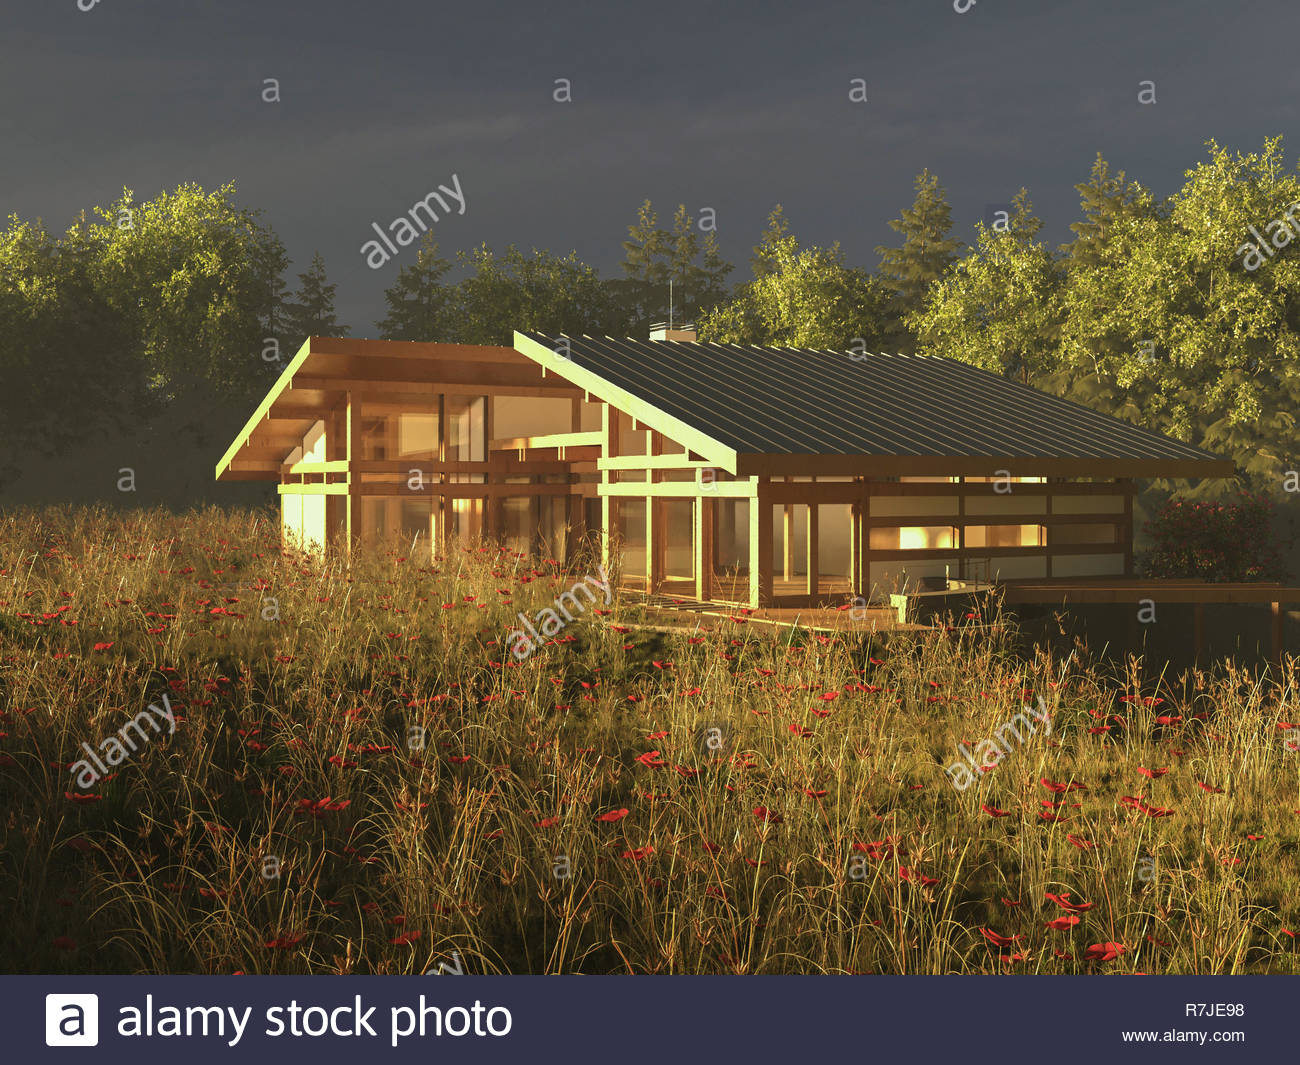 Modern house design exterior render image - Stock Image